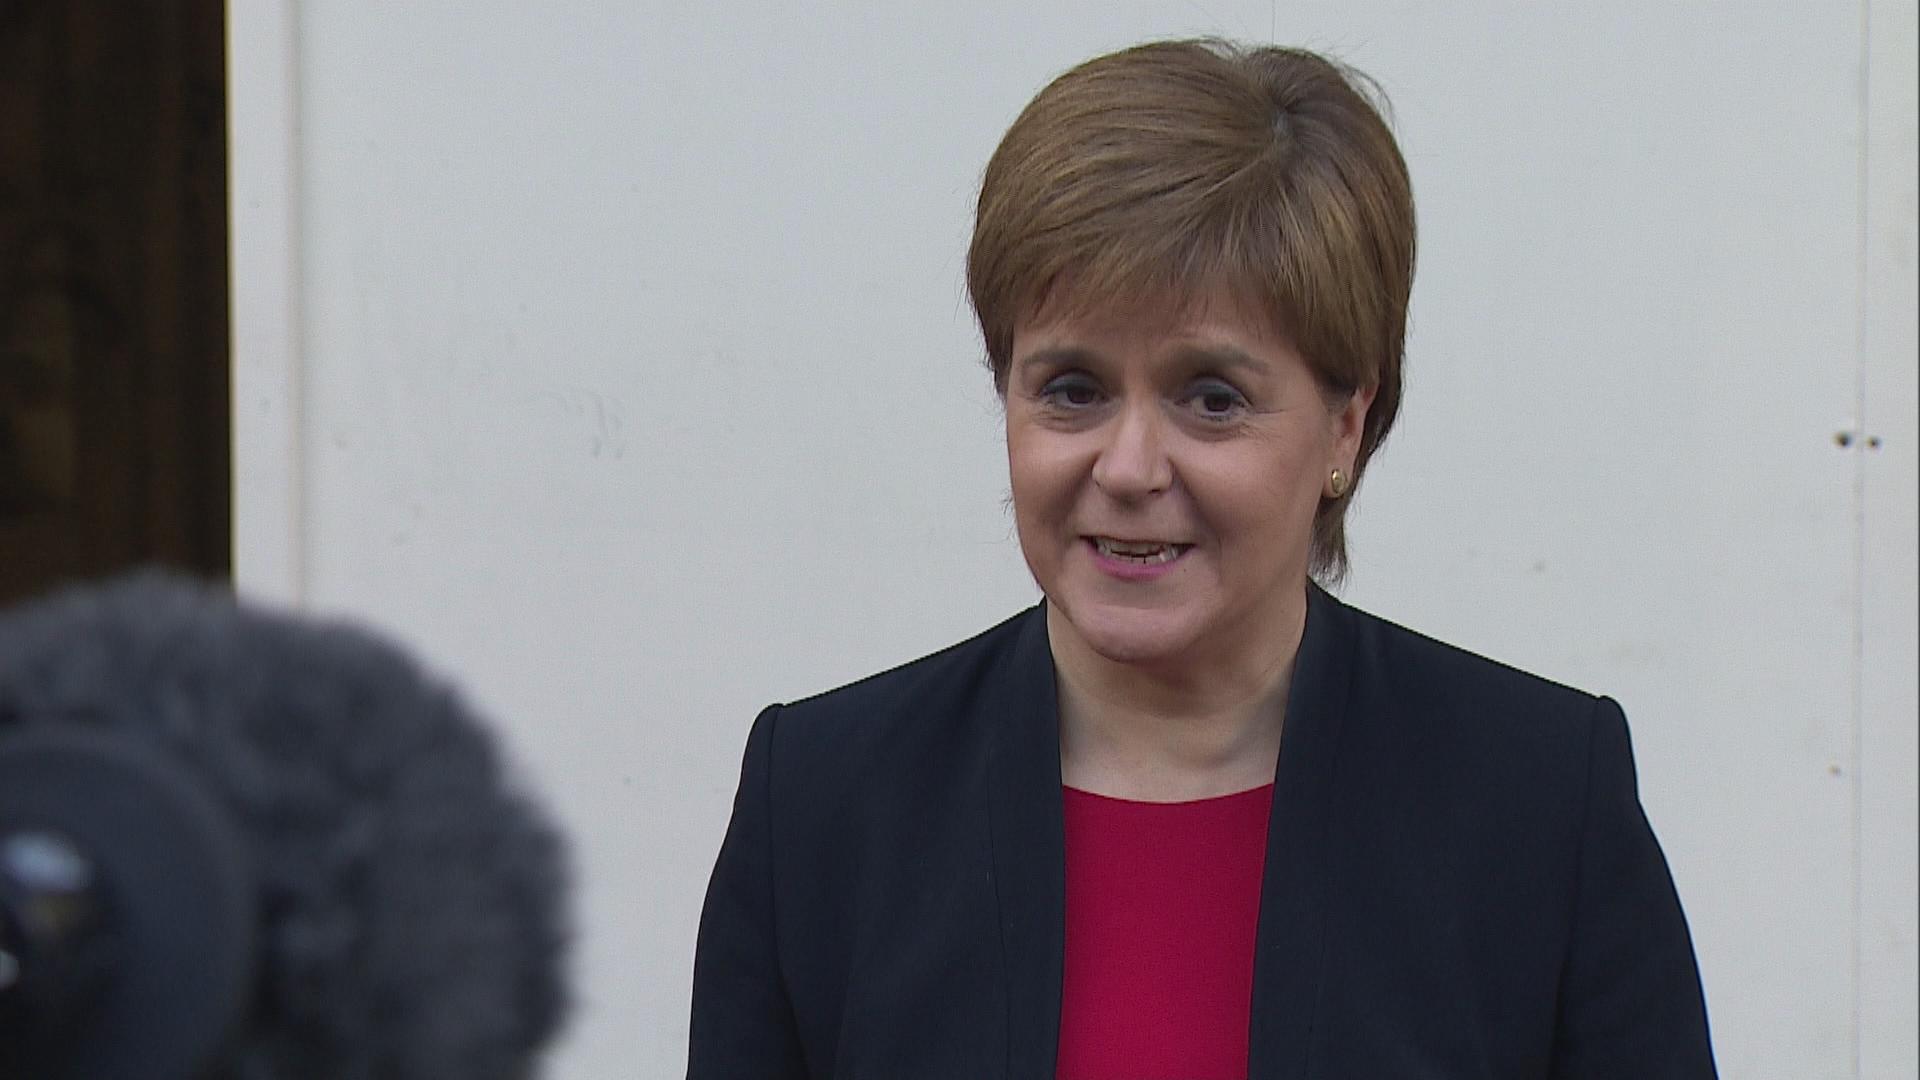 Nicola Sturgeon Plans Second Scottish Independence Referendum Before May 2021